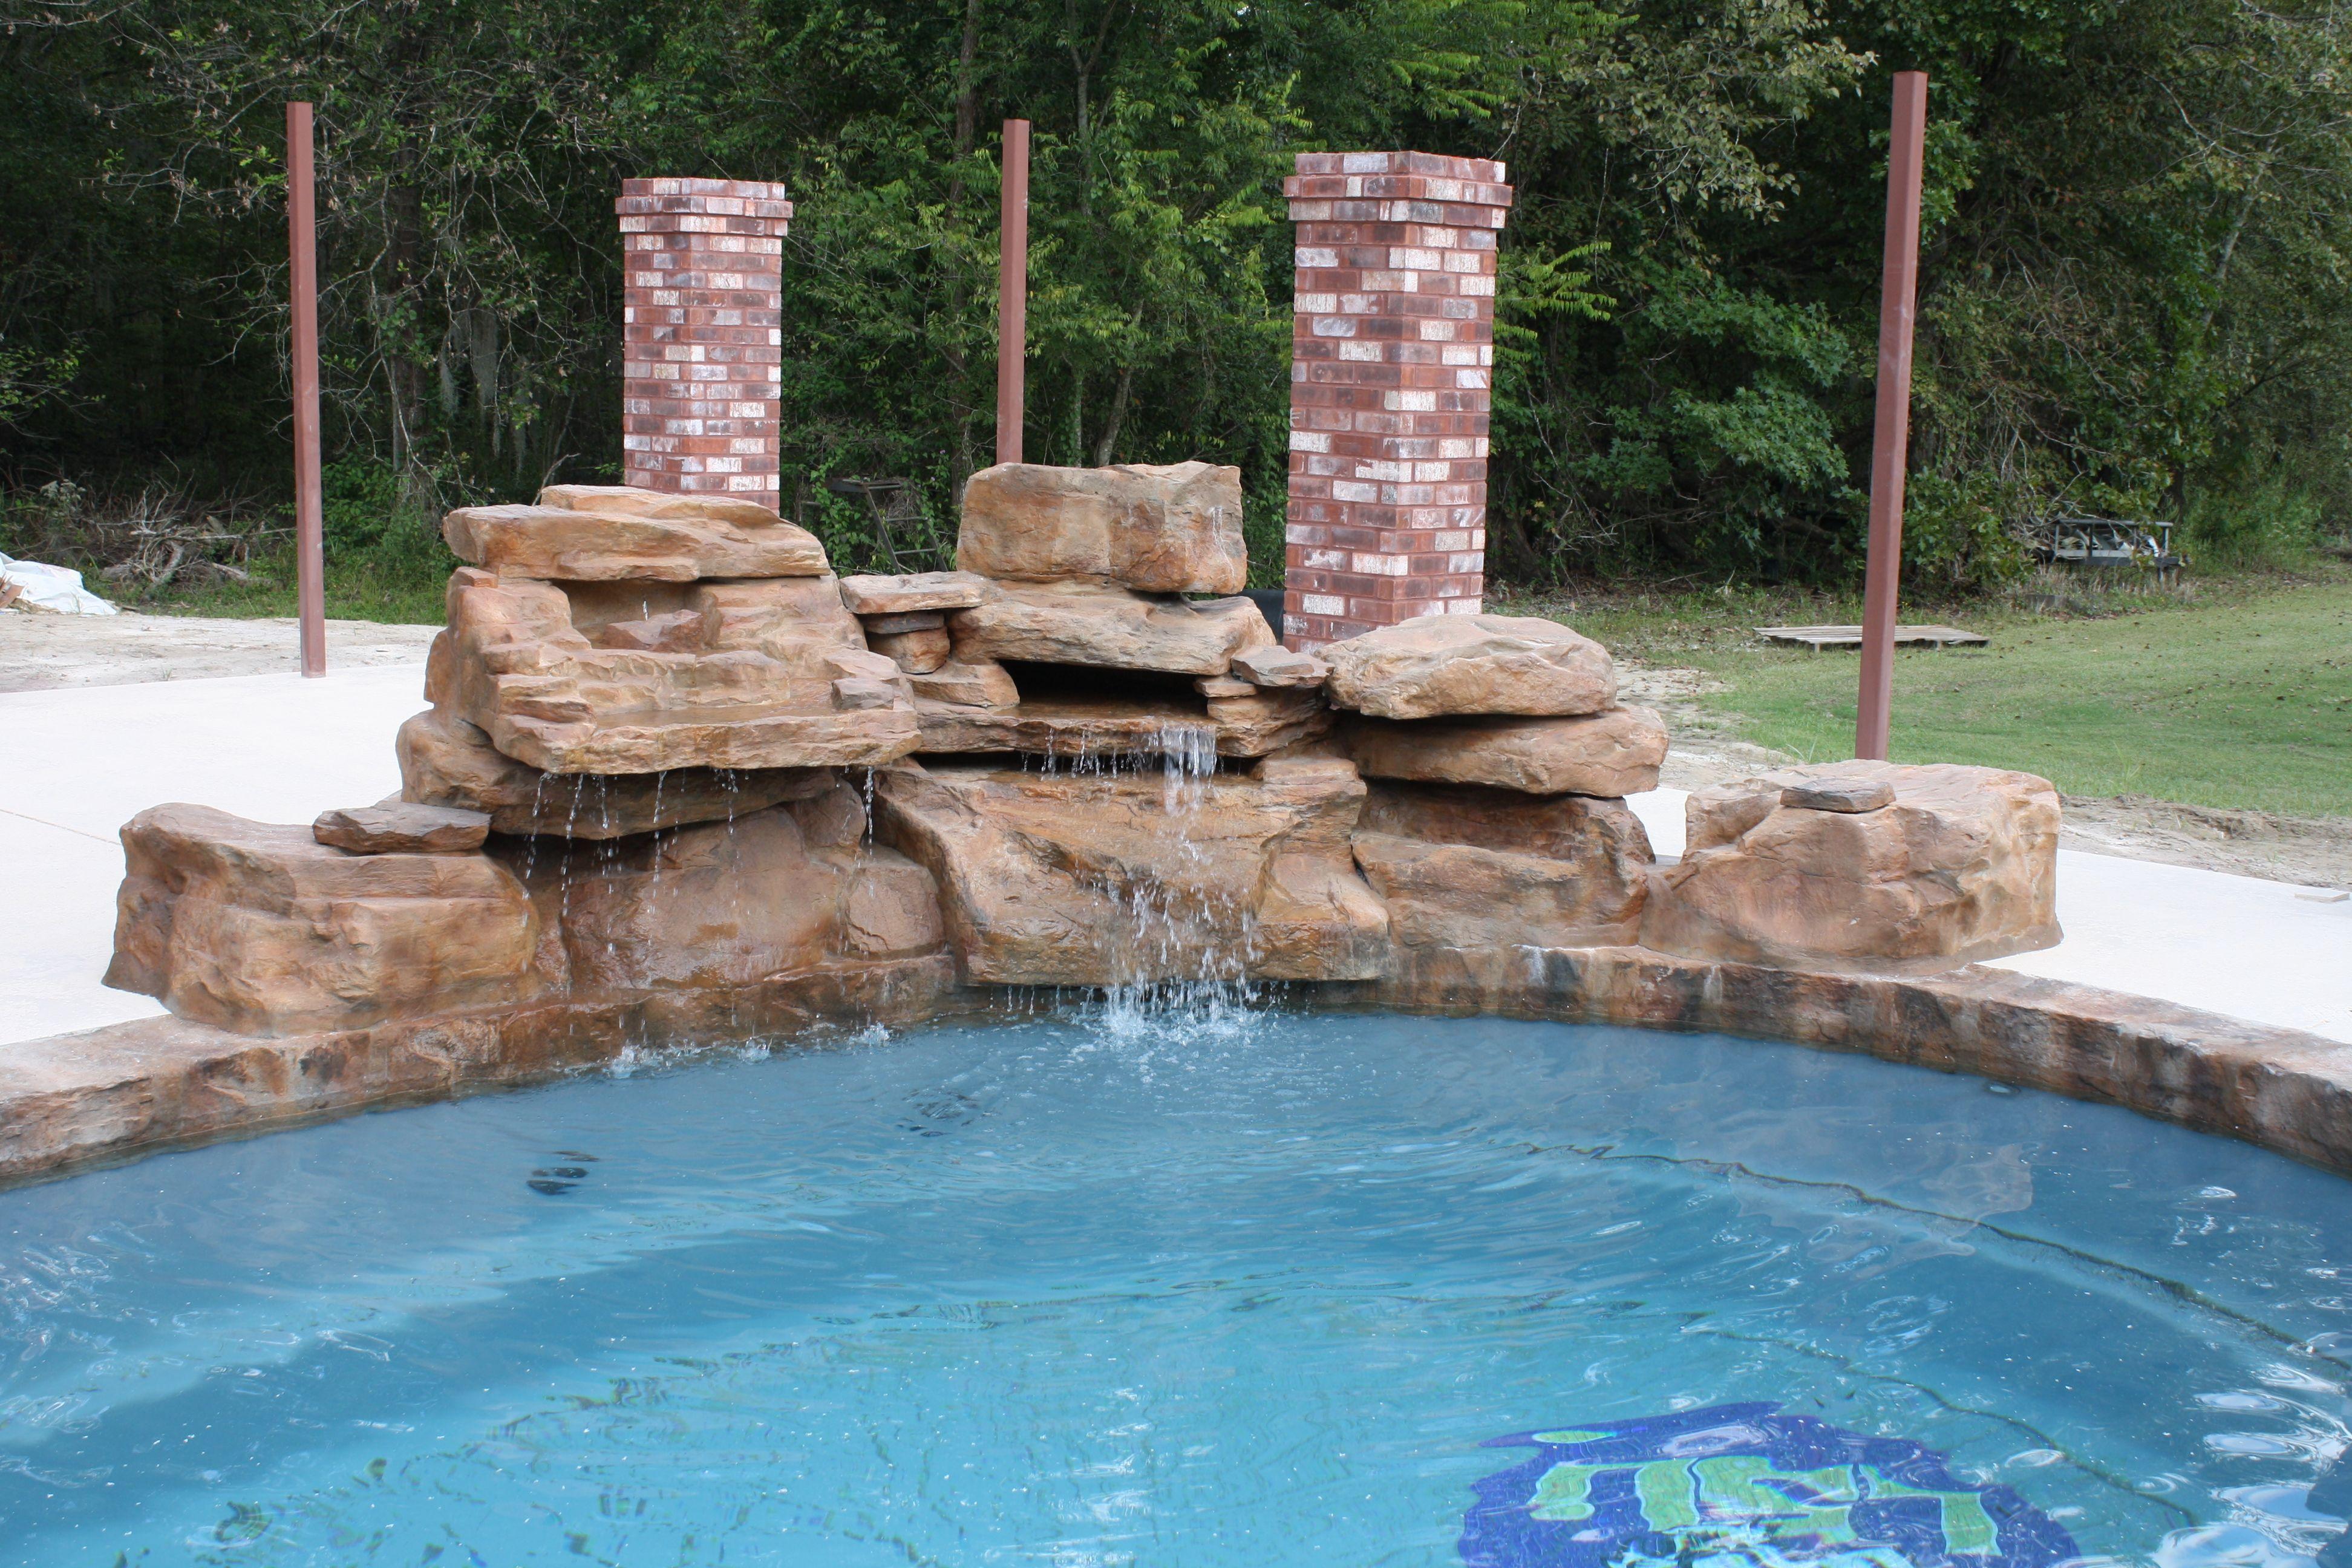 Central Pools Baton Rouge Fiberglass Pools Swimming Pools Pool Waterfall Swimming Pool Waterfall